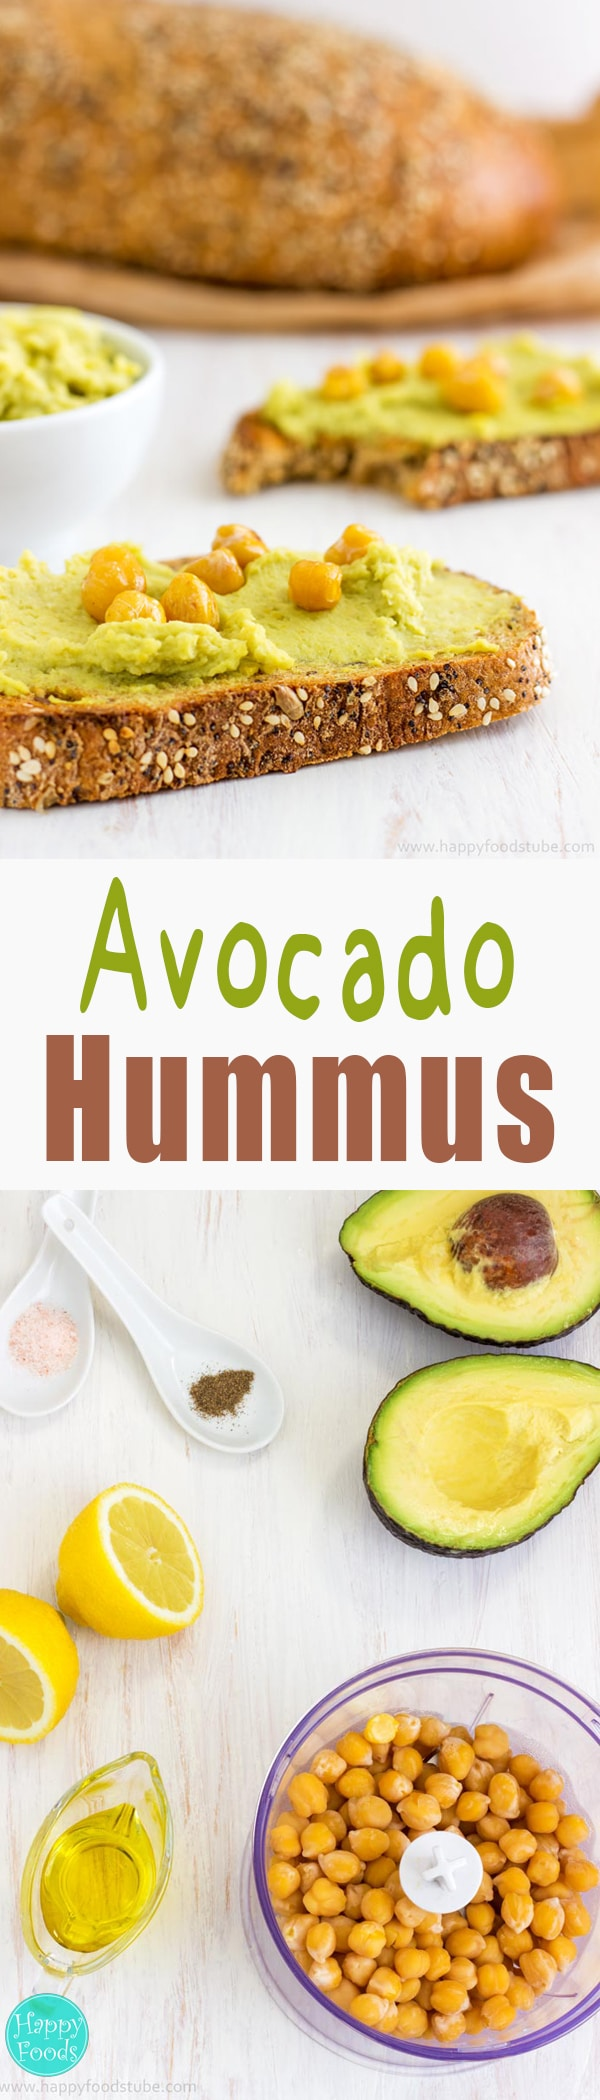 Super Healthy Creamy Avocado Hummus - Only 4-ingredients - avocado, chickpeas (garbanzo beans), lemon, extra virgin olive oil. Vegan / Vegetarian